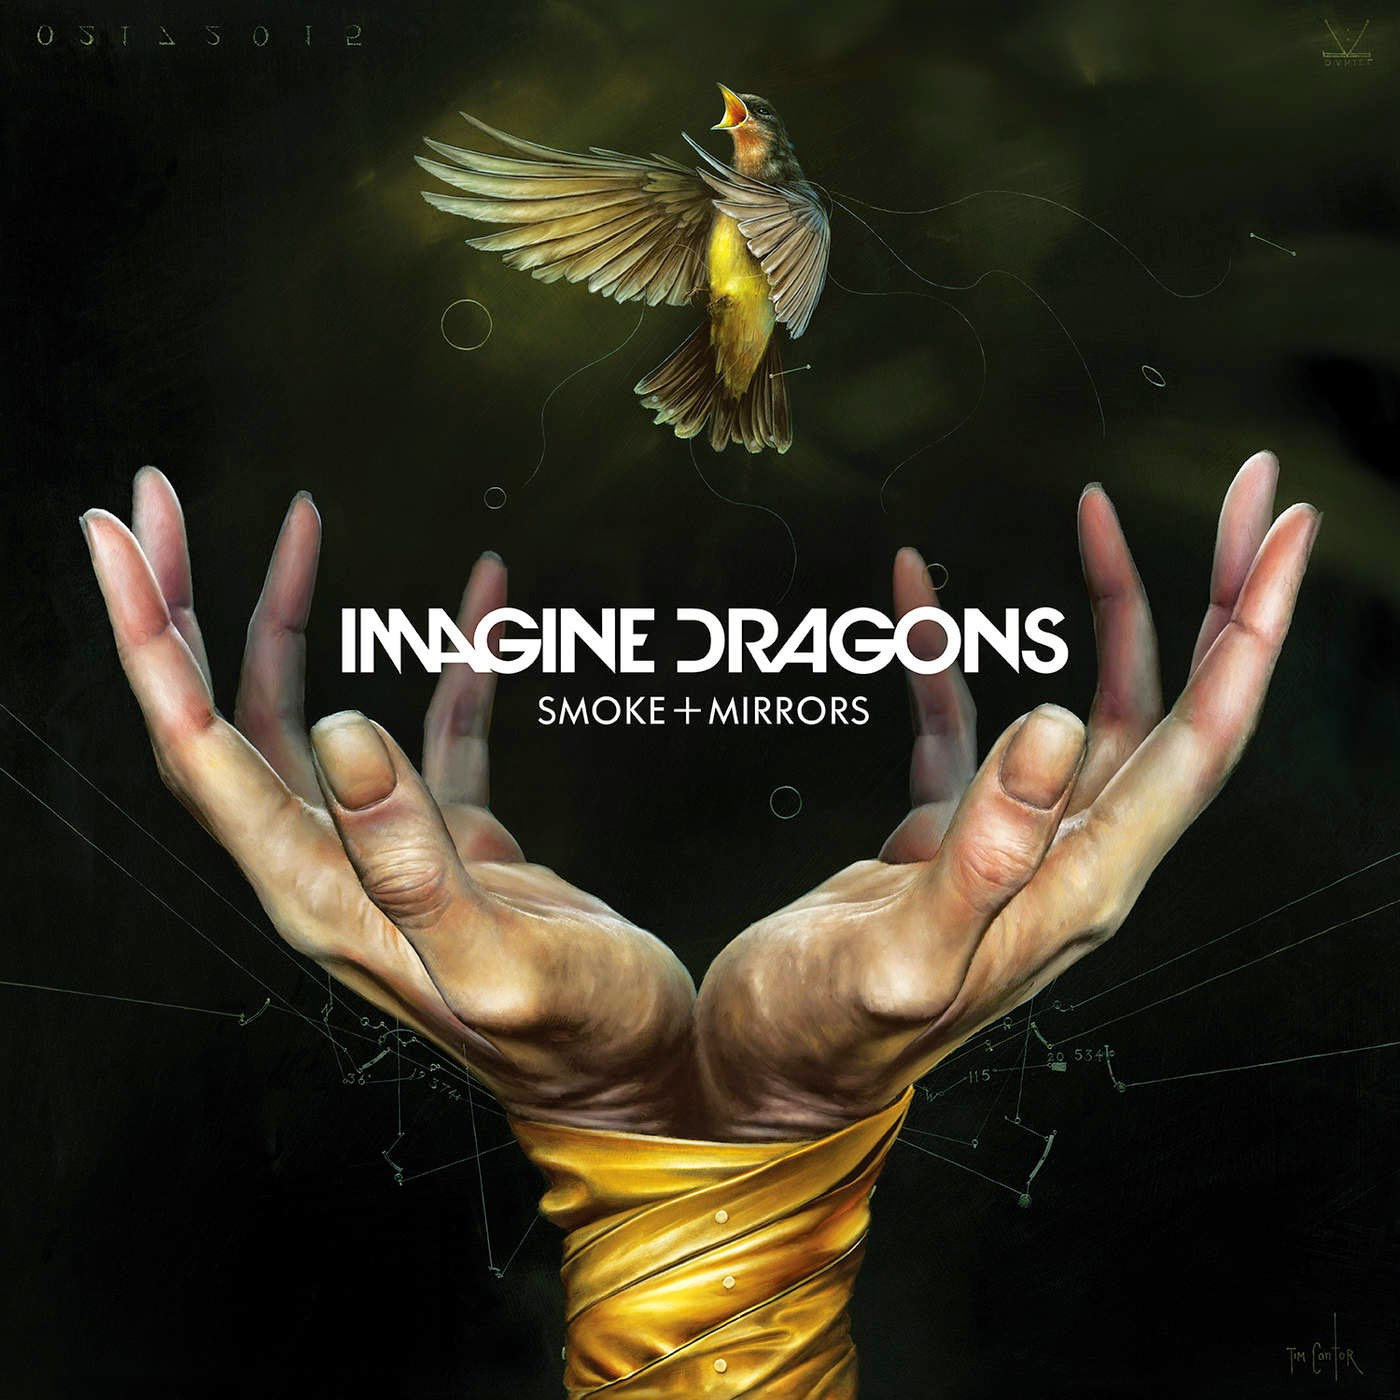 Imagine Dragons - Smoke + Mirrors - Pre-Order Singles